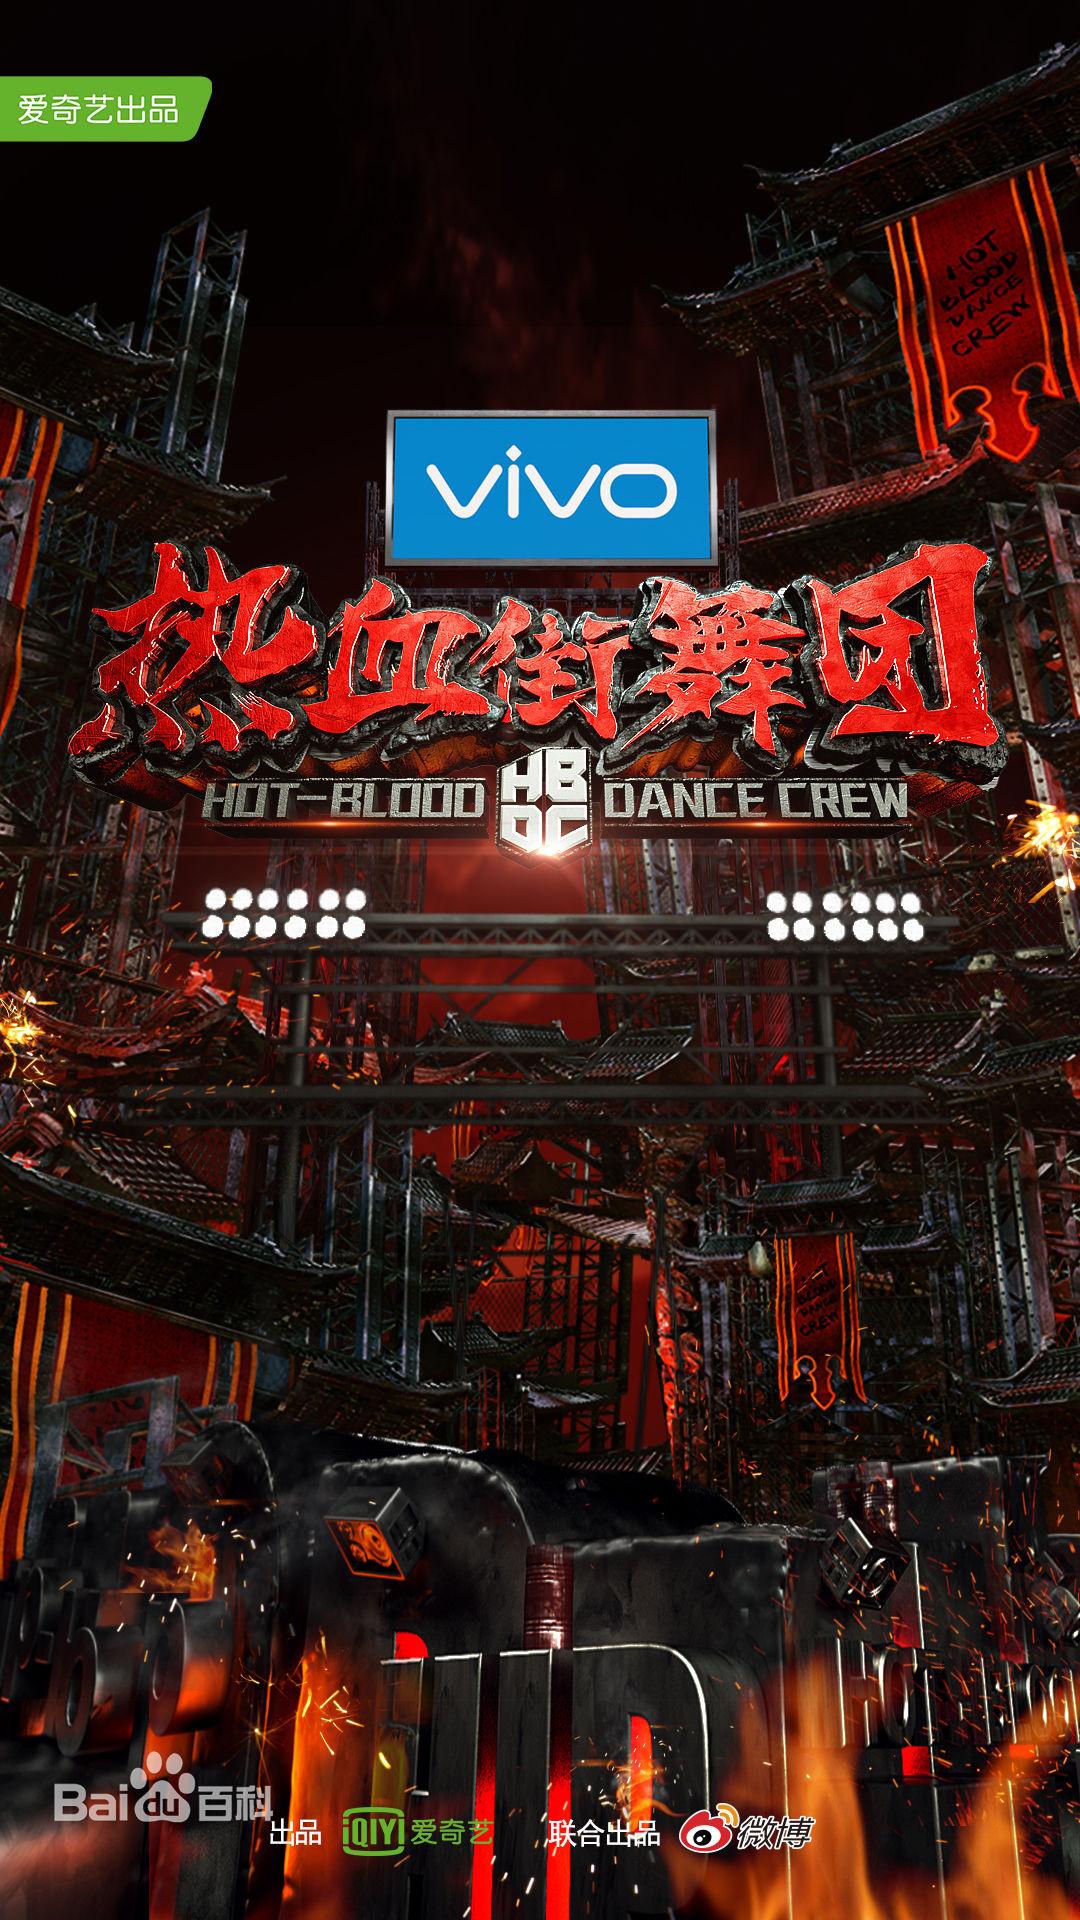 Hot Blood Dance Crew